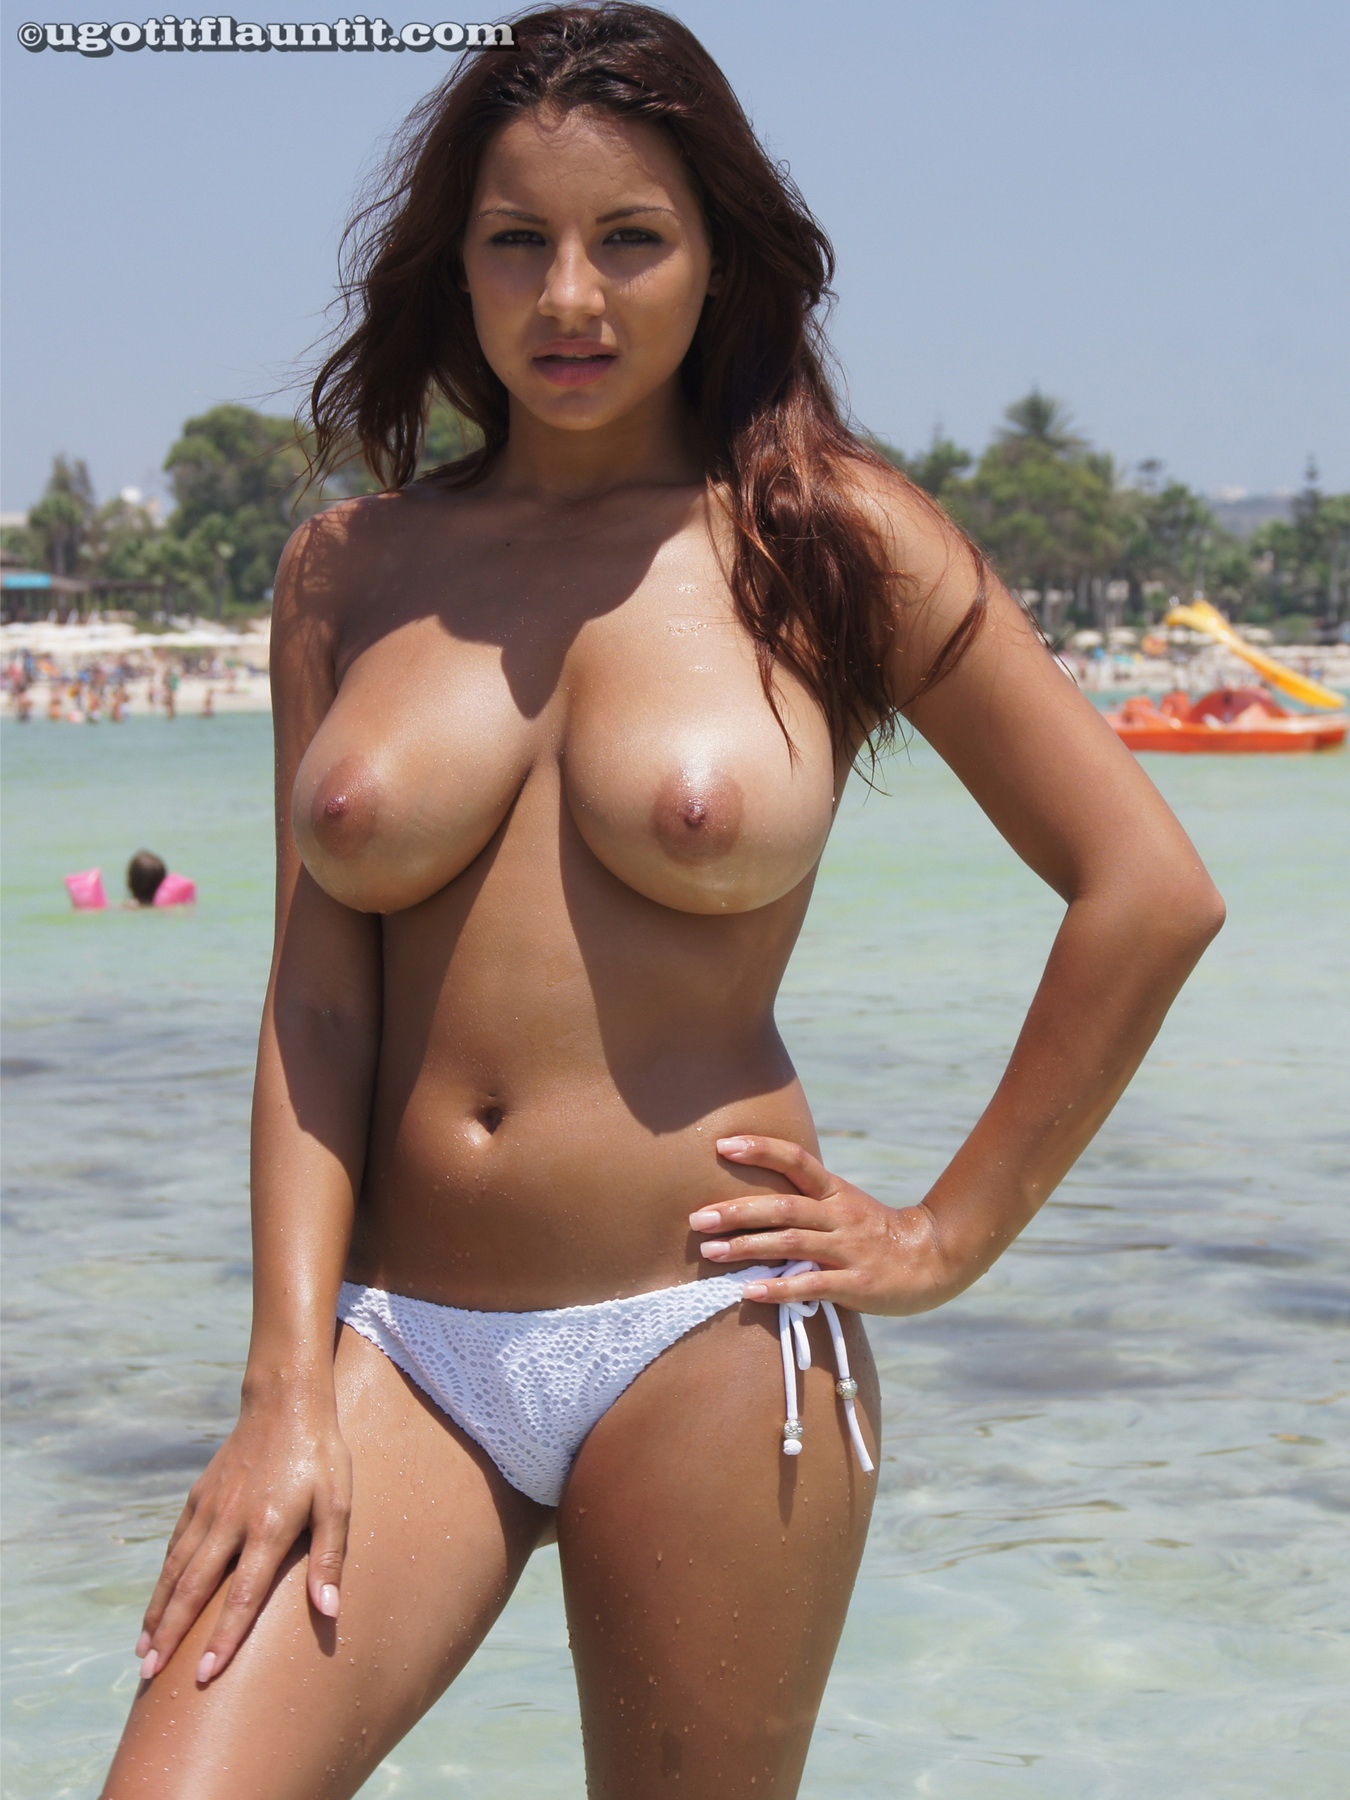 Of Amateur Bikini Teens Pics